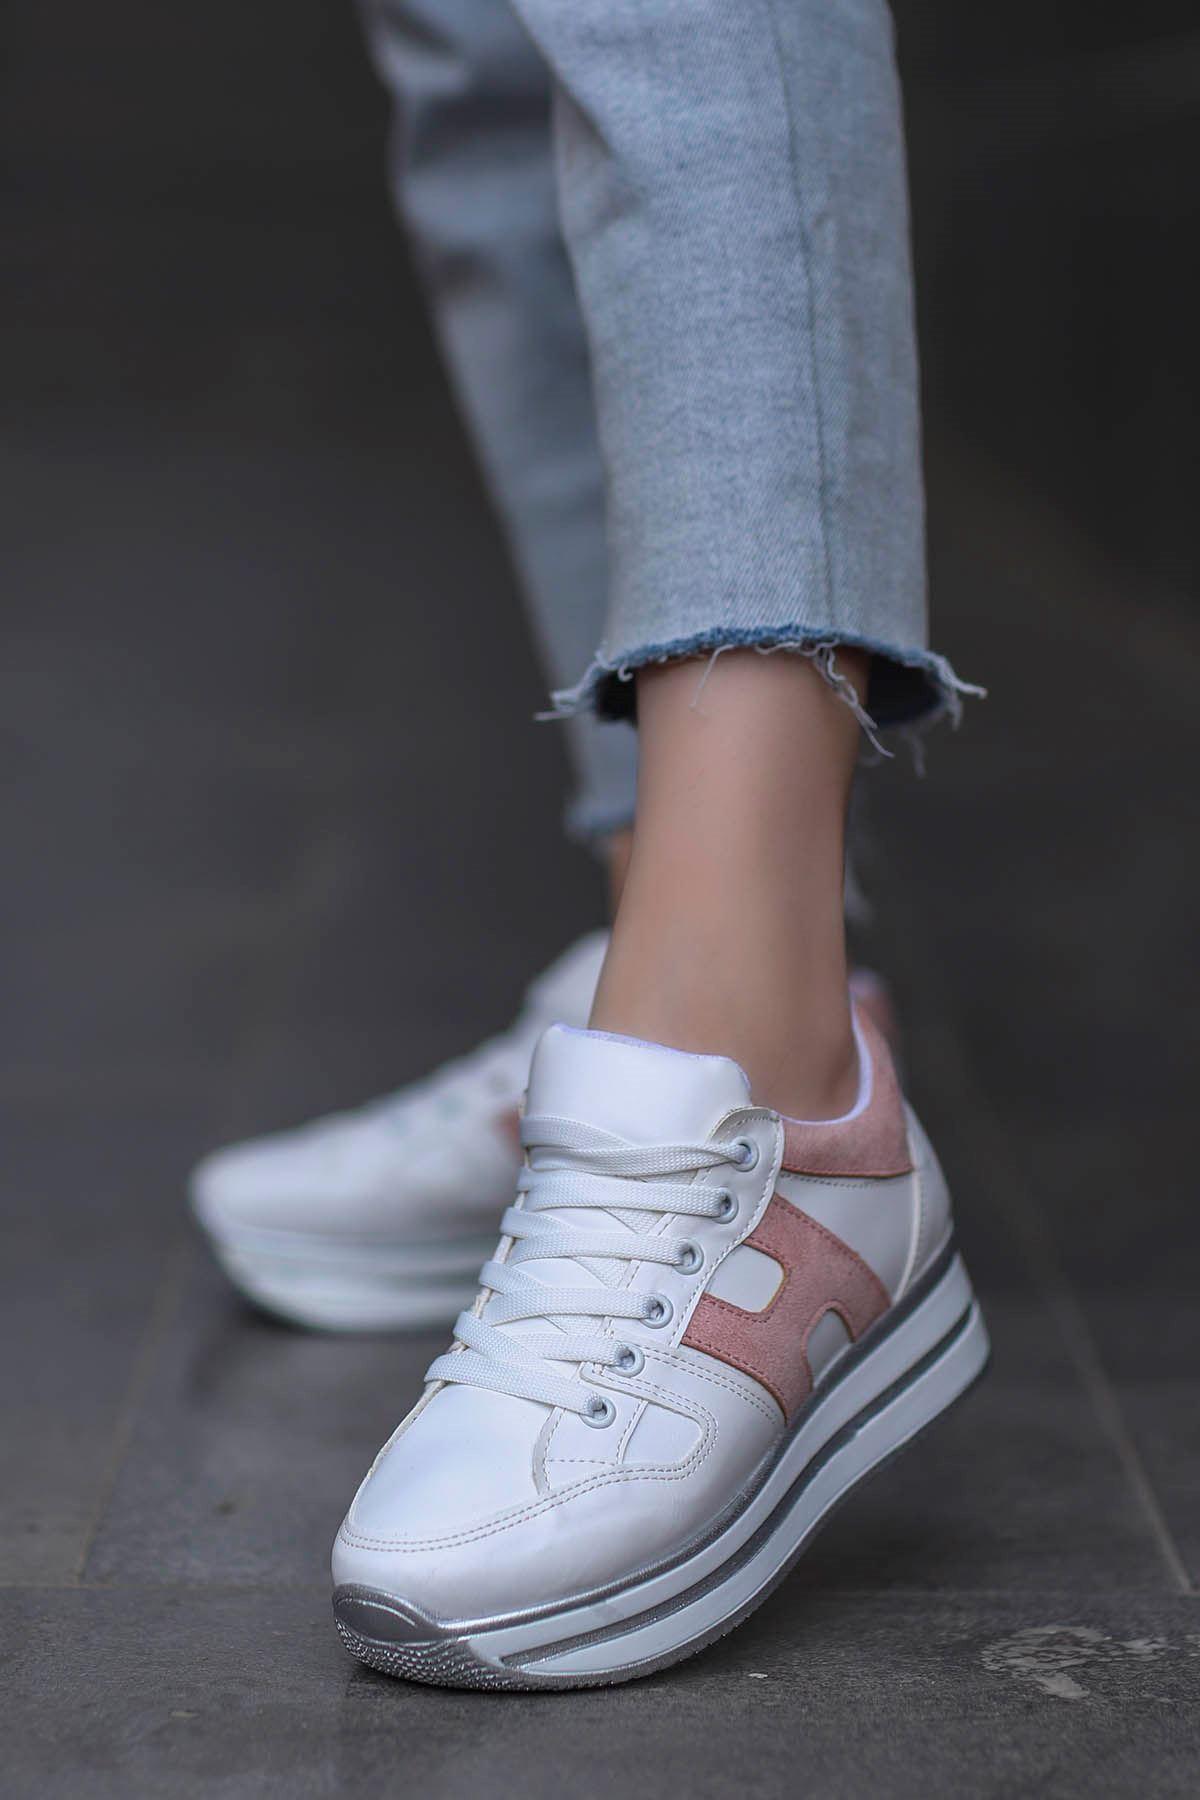 Sofia Spor Ayakkabı Beyaz Pudra Detay